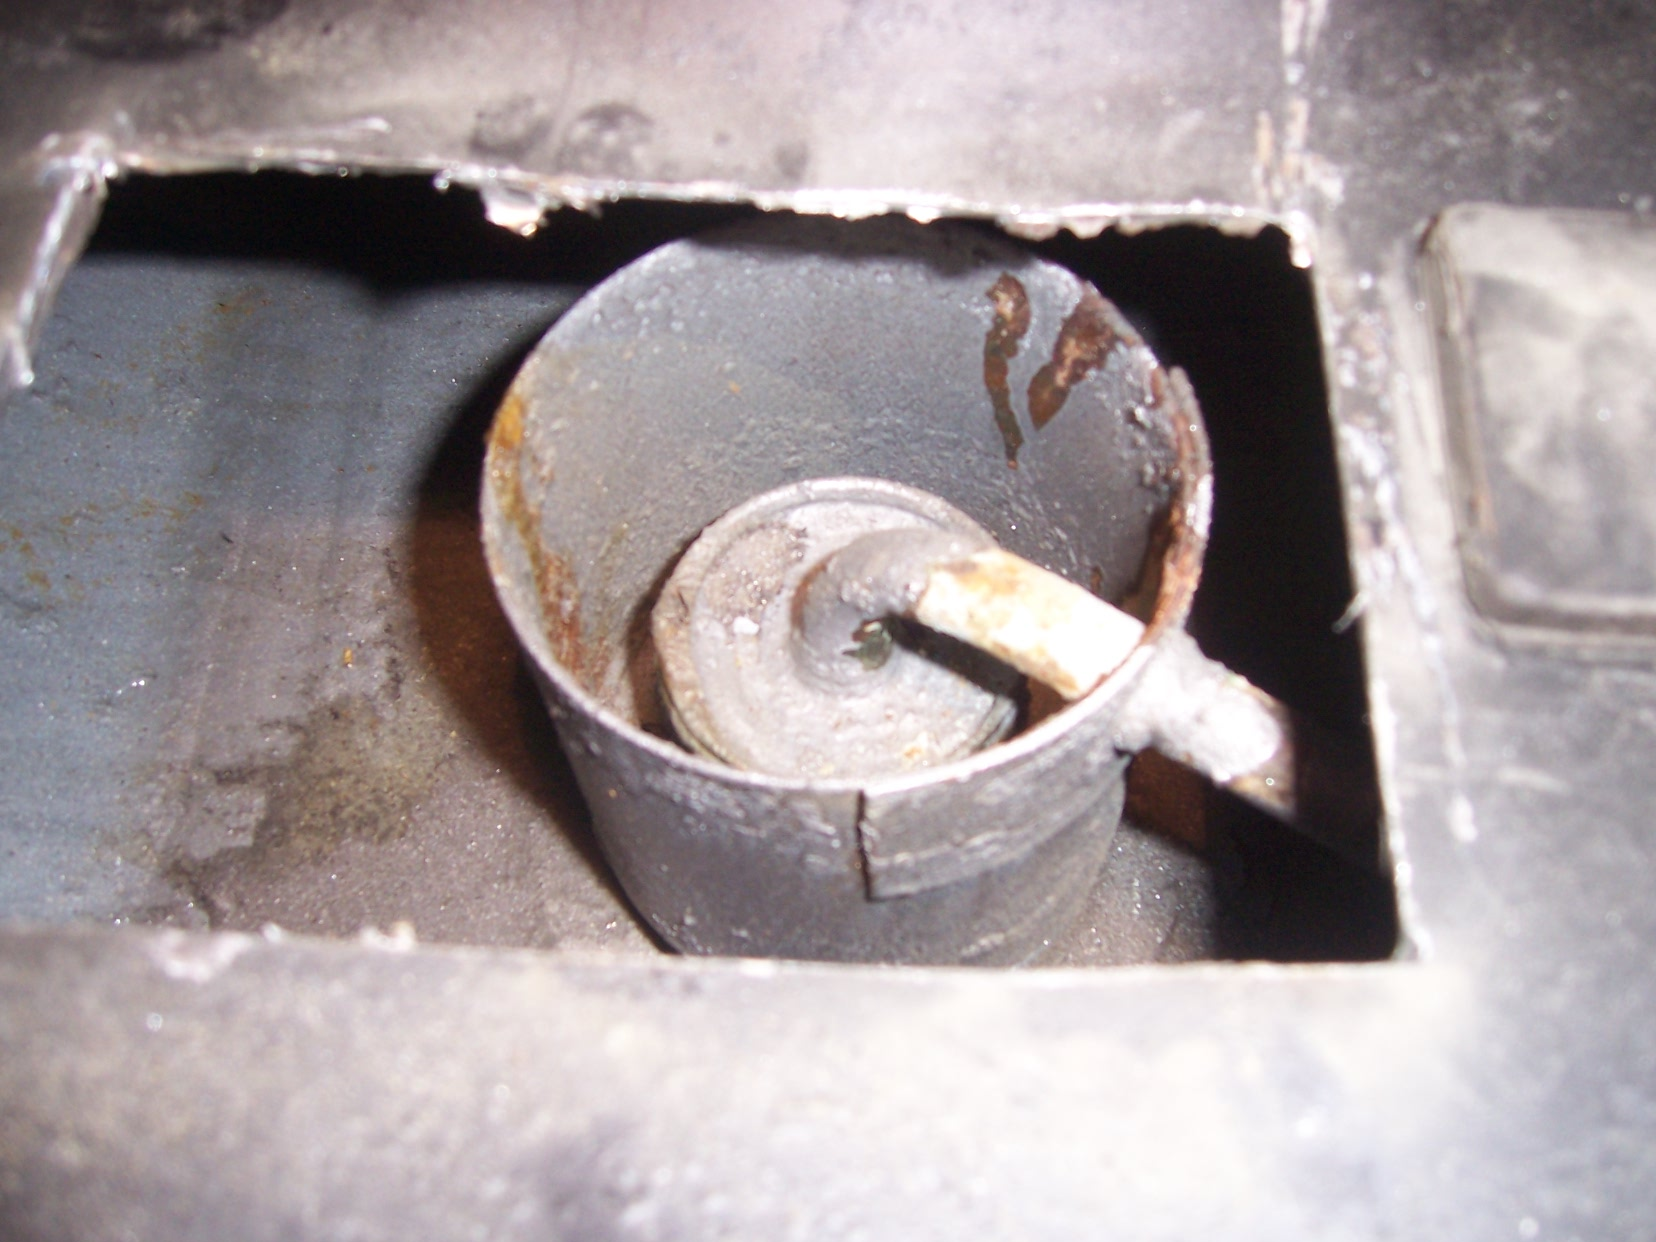 por 15 fuel tank repair question s30 series 240z 260z 280z rh forums hybridz org 280Z Tunnel 1978 Nissan 280Z Gas Tank